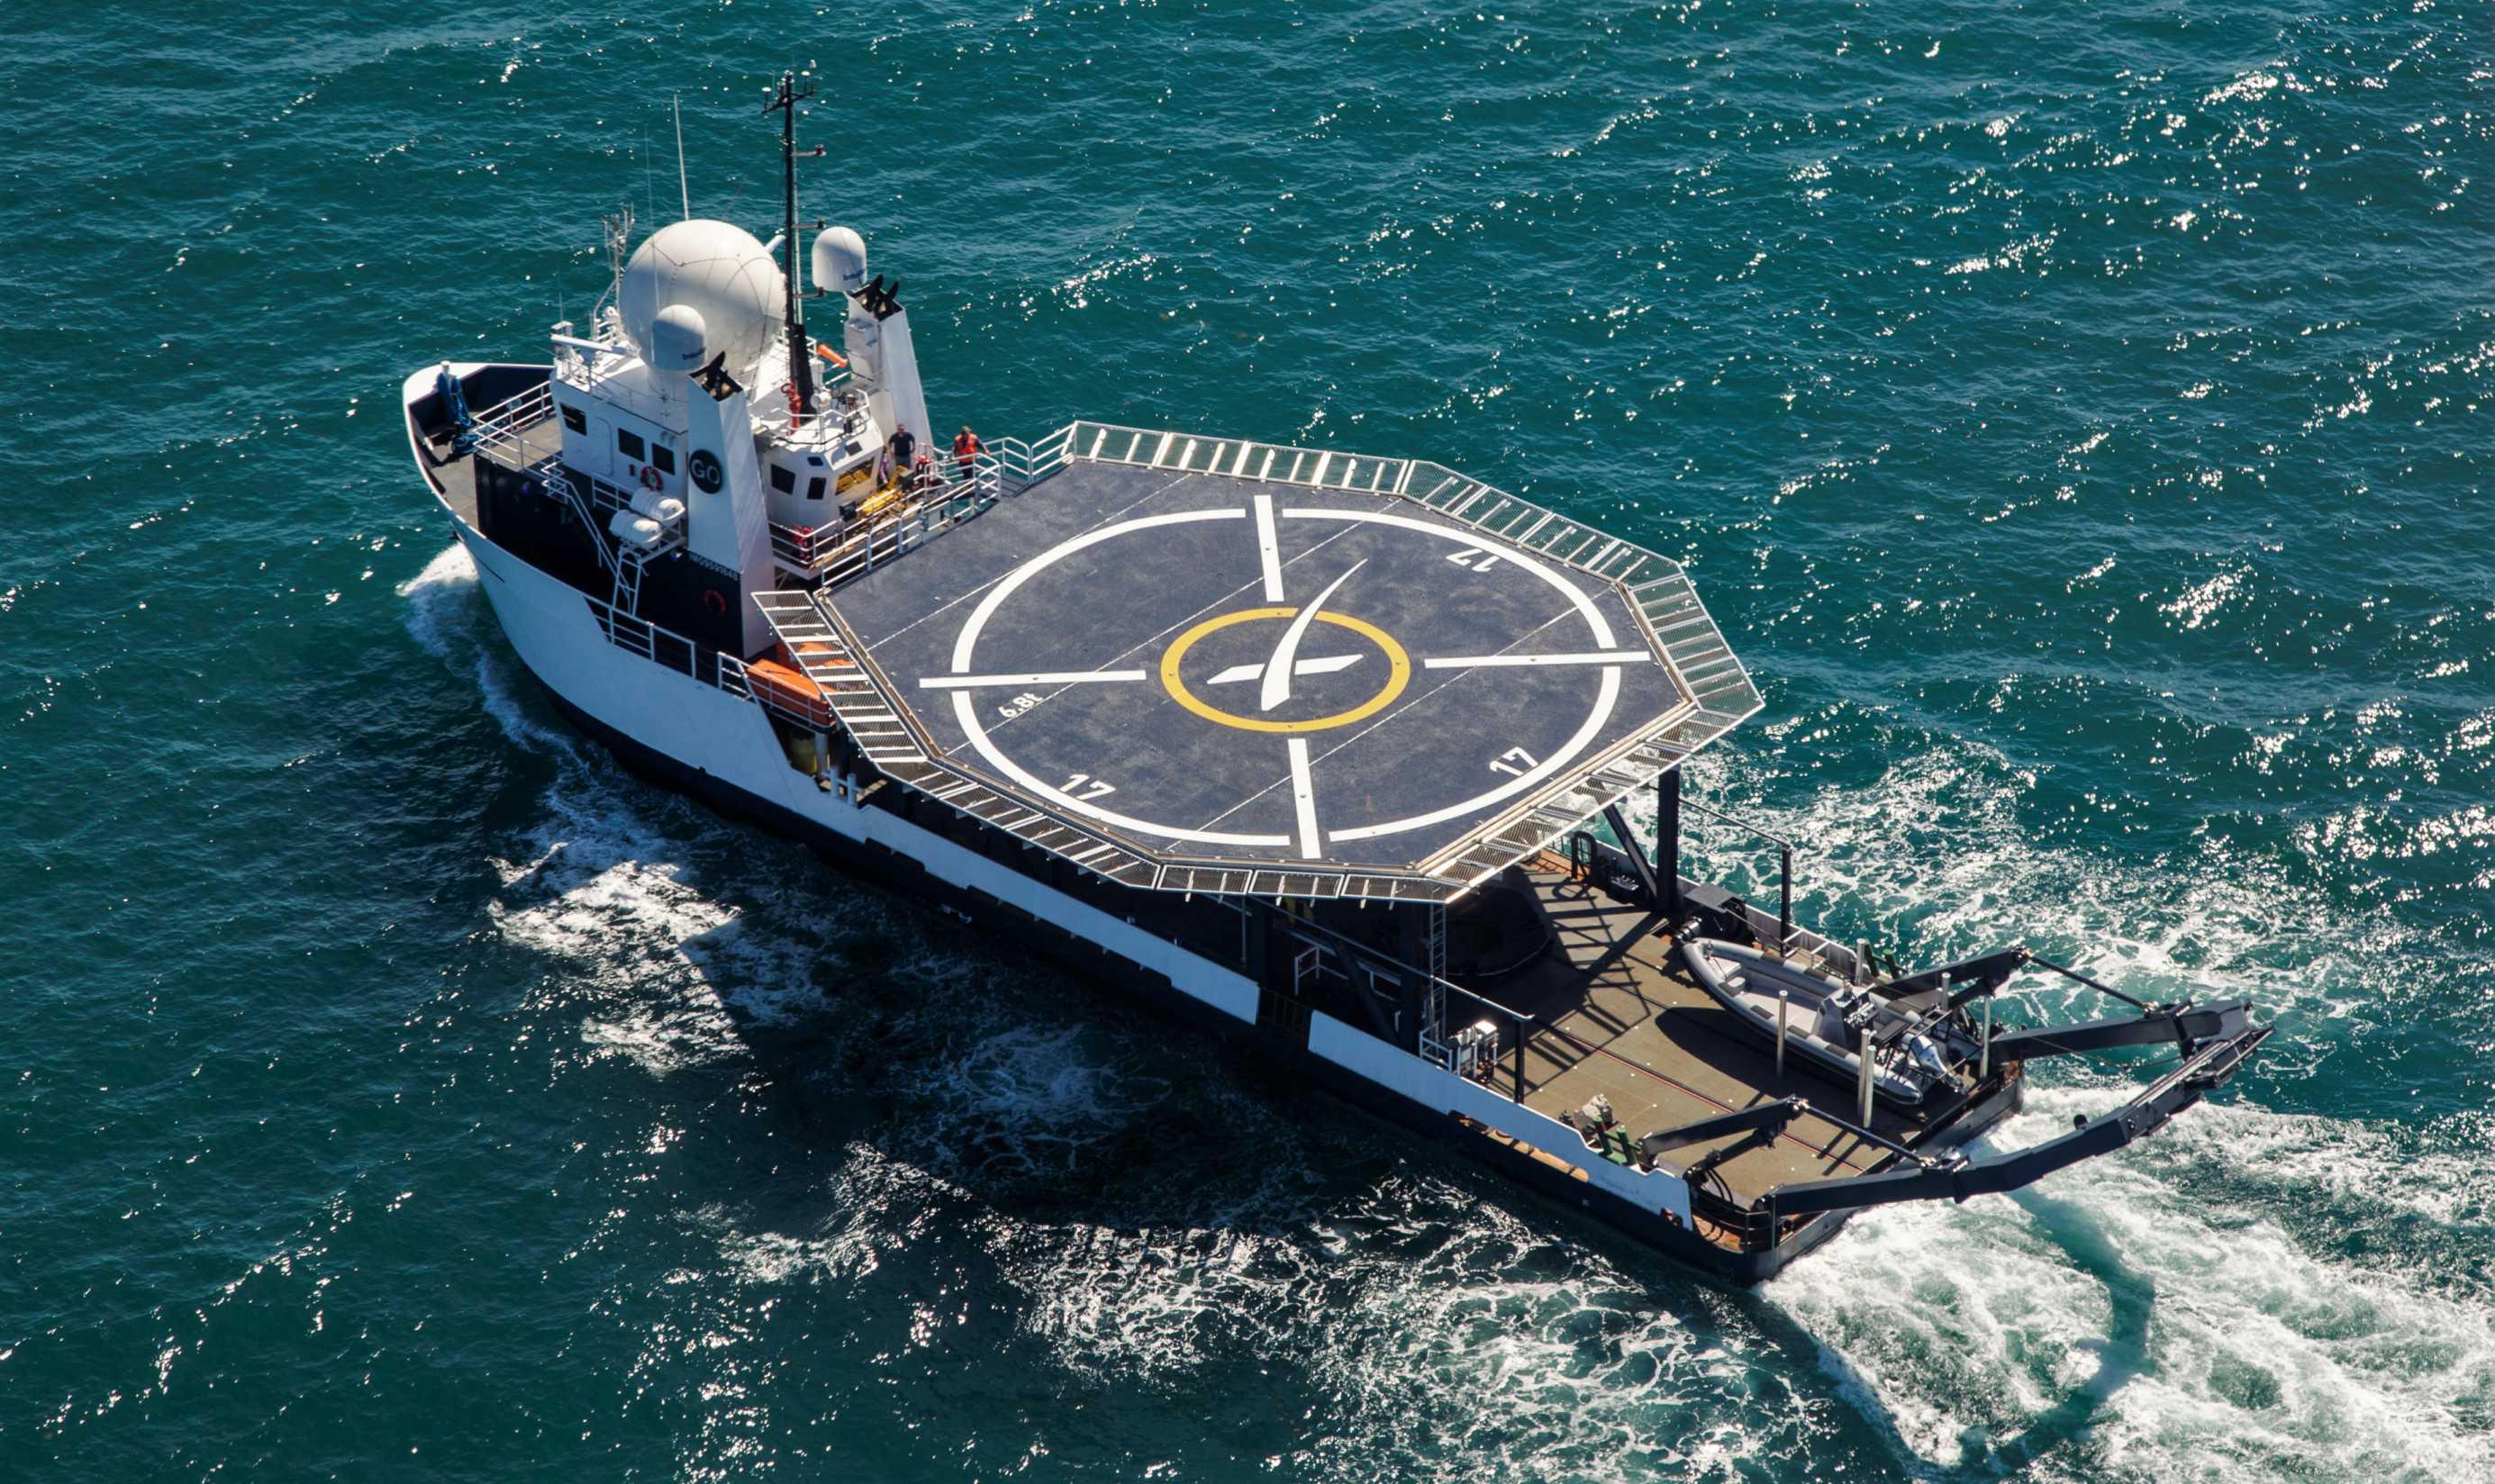 GO Searcher helipad tests Oct 2018 (NASA) 2(c)